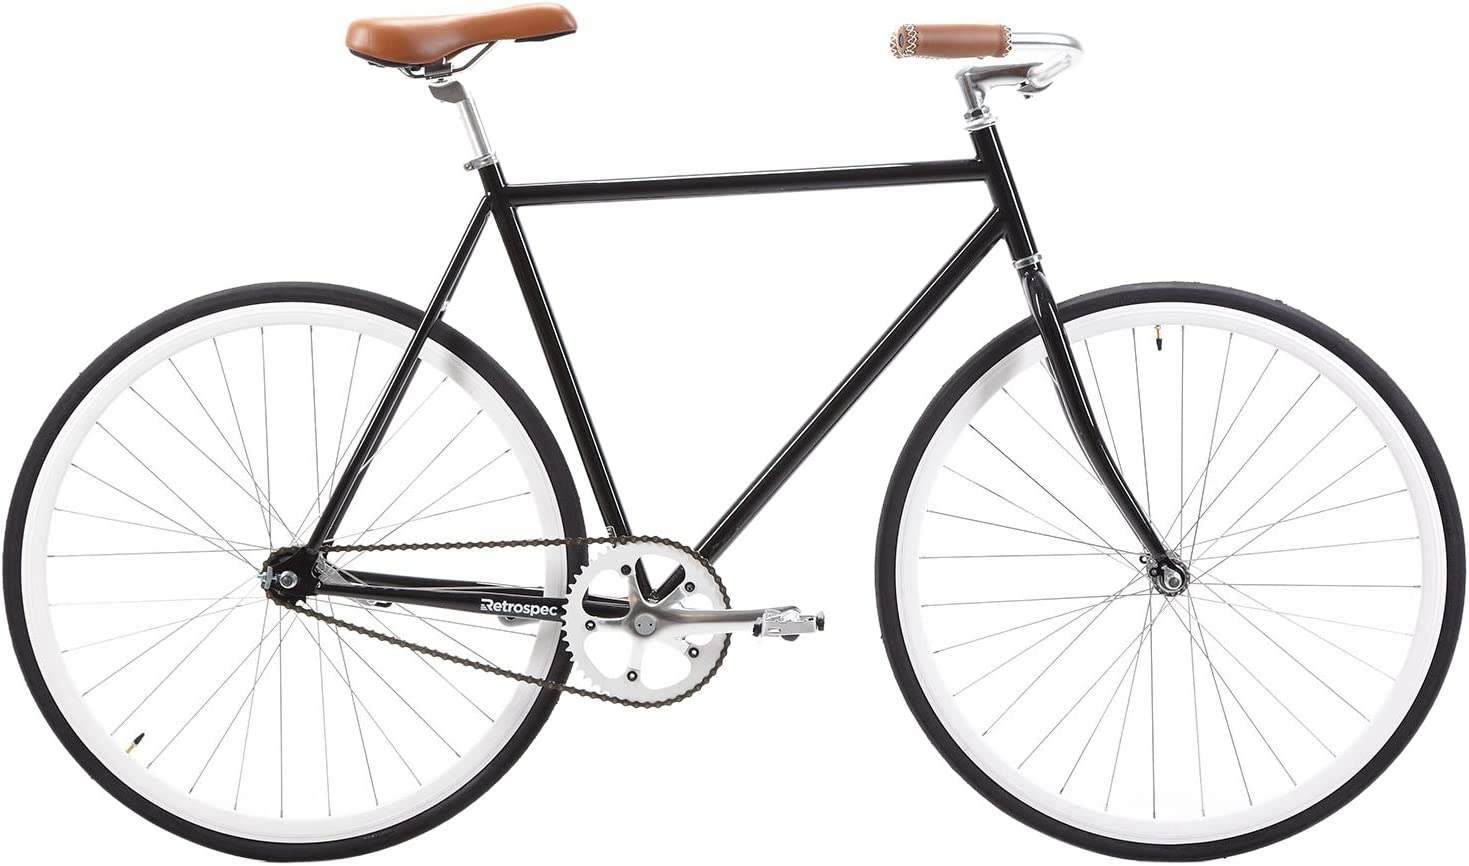 Retrospec Fixie Bike